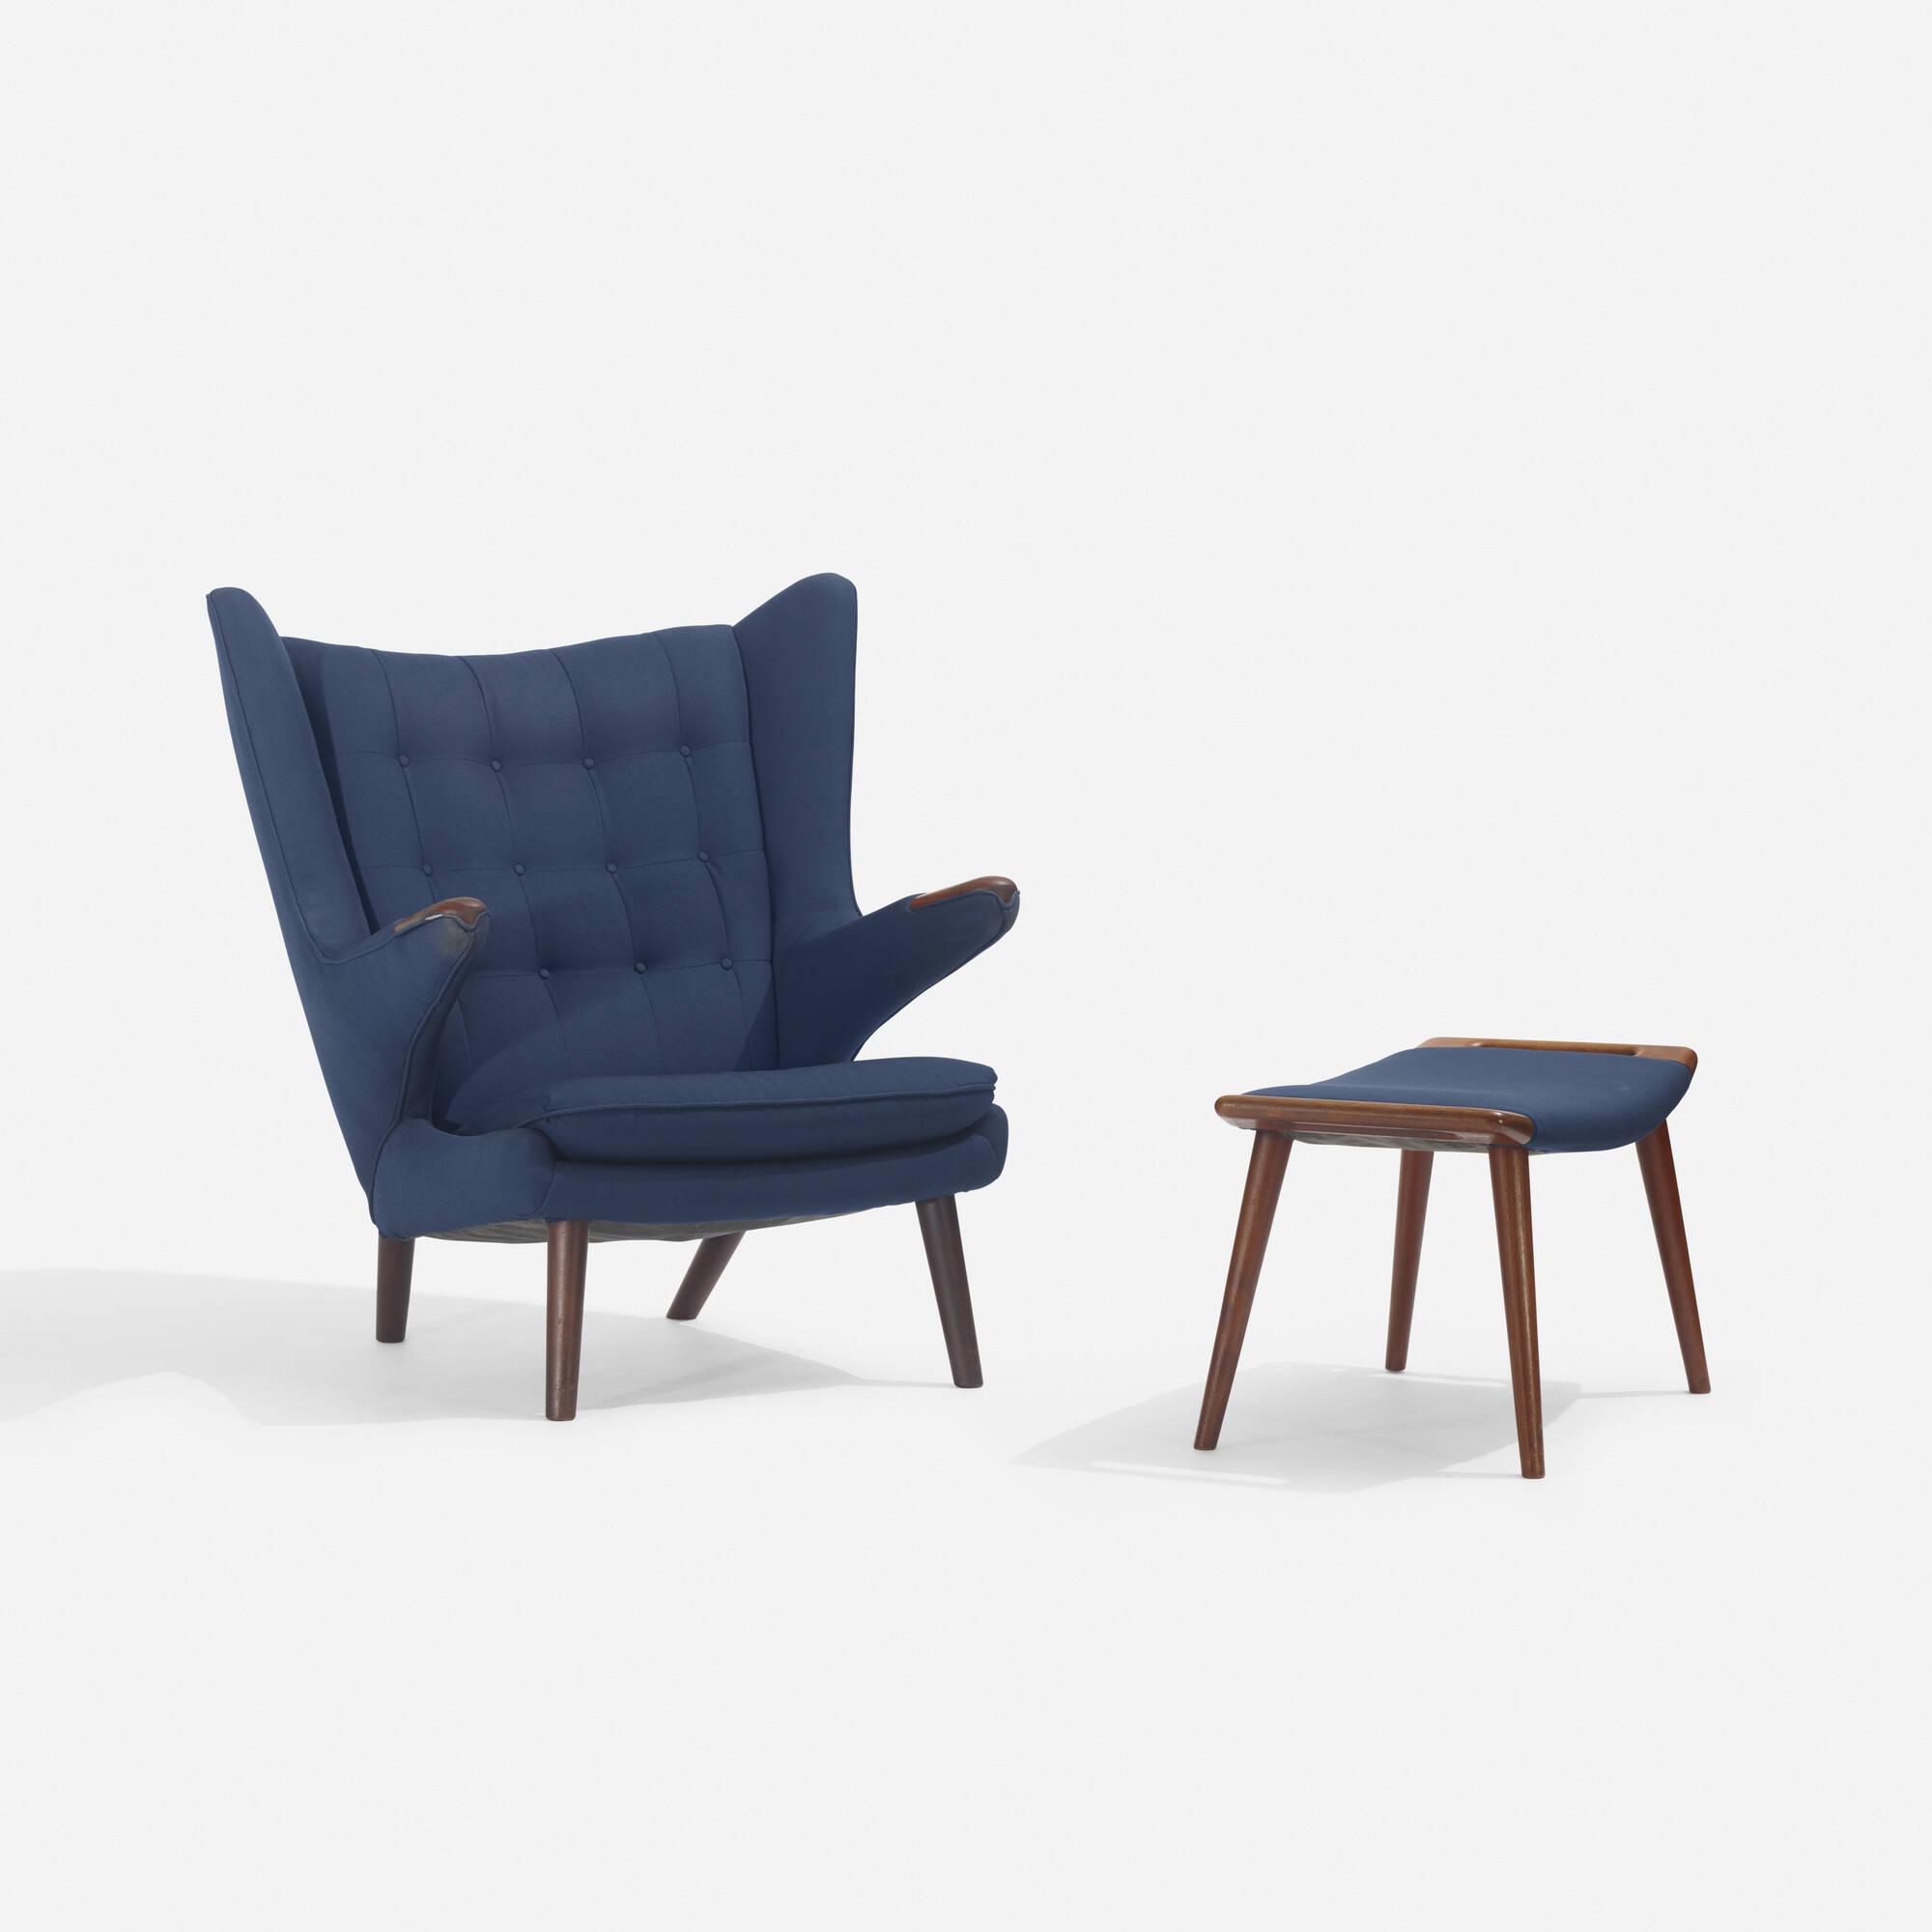 132: Hans J. Wegner / Papa Bear chair and ottoman (1 of 3)